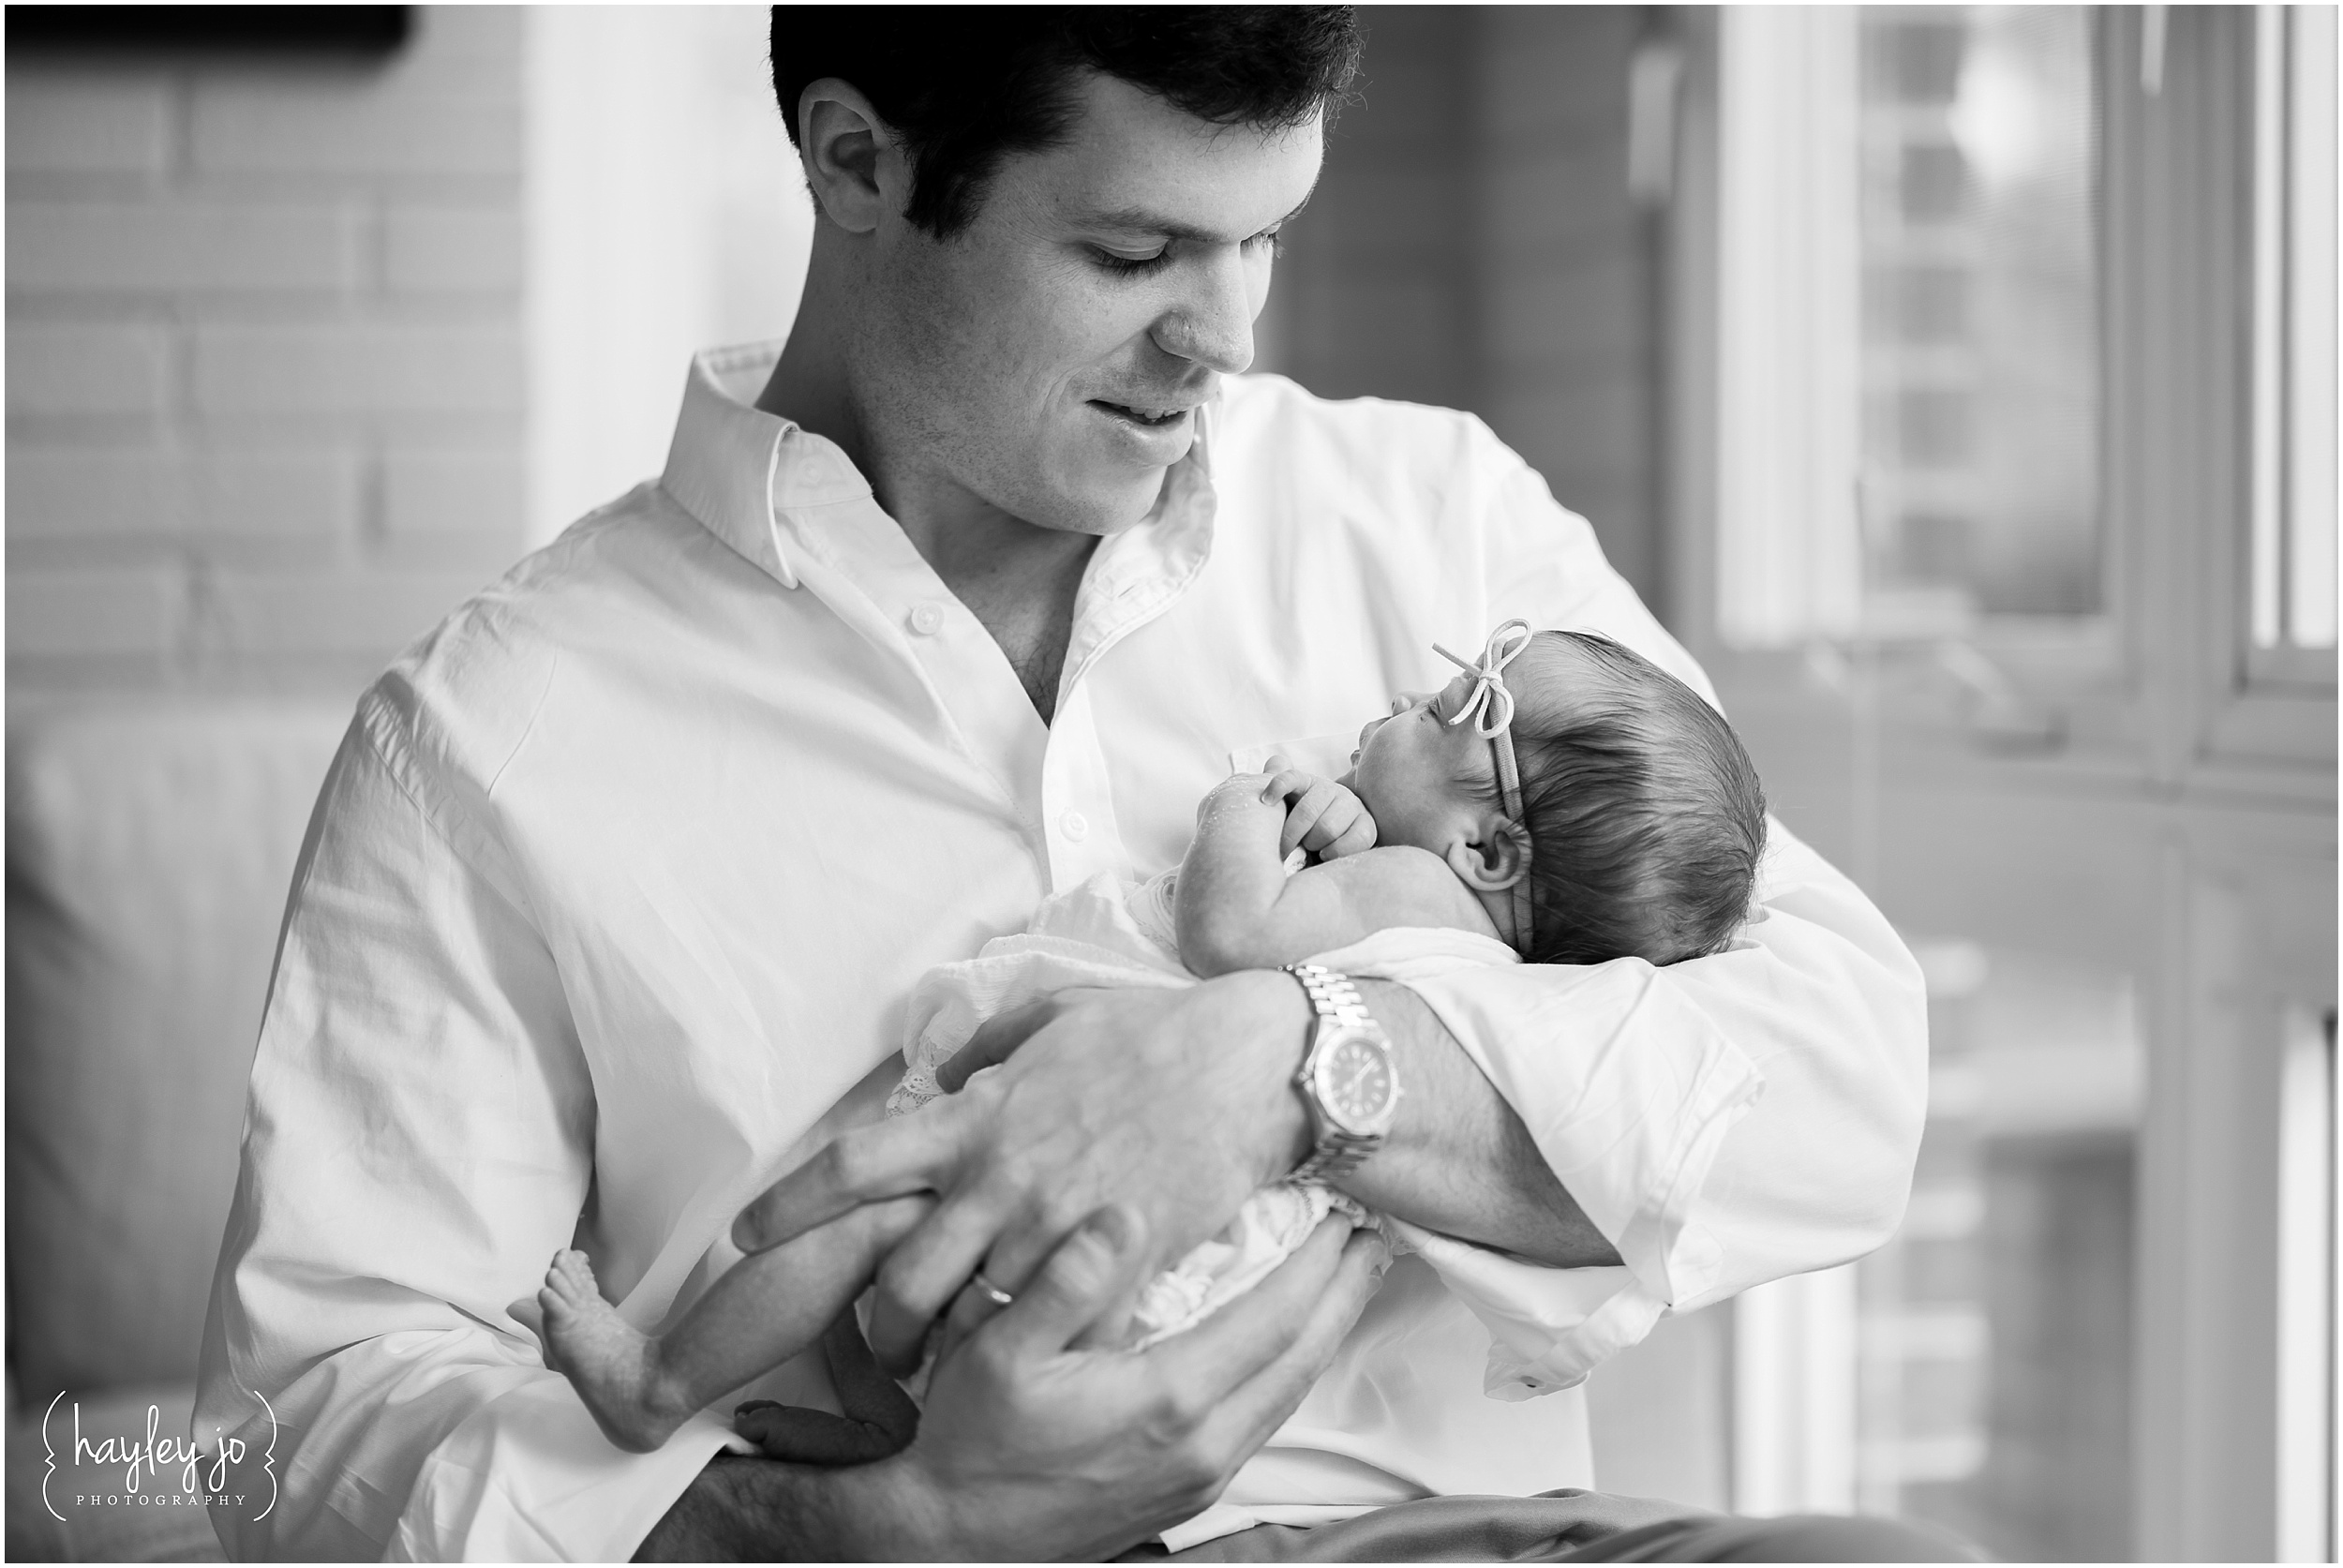 atlanta-newborn-photographer-hayley-jo-photography-atlanta-family-photographer_0138.jpg